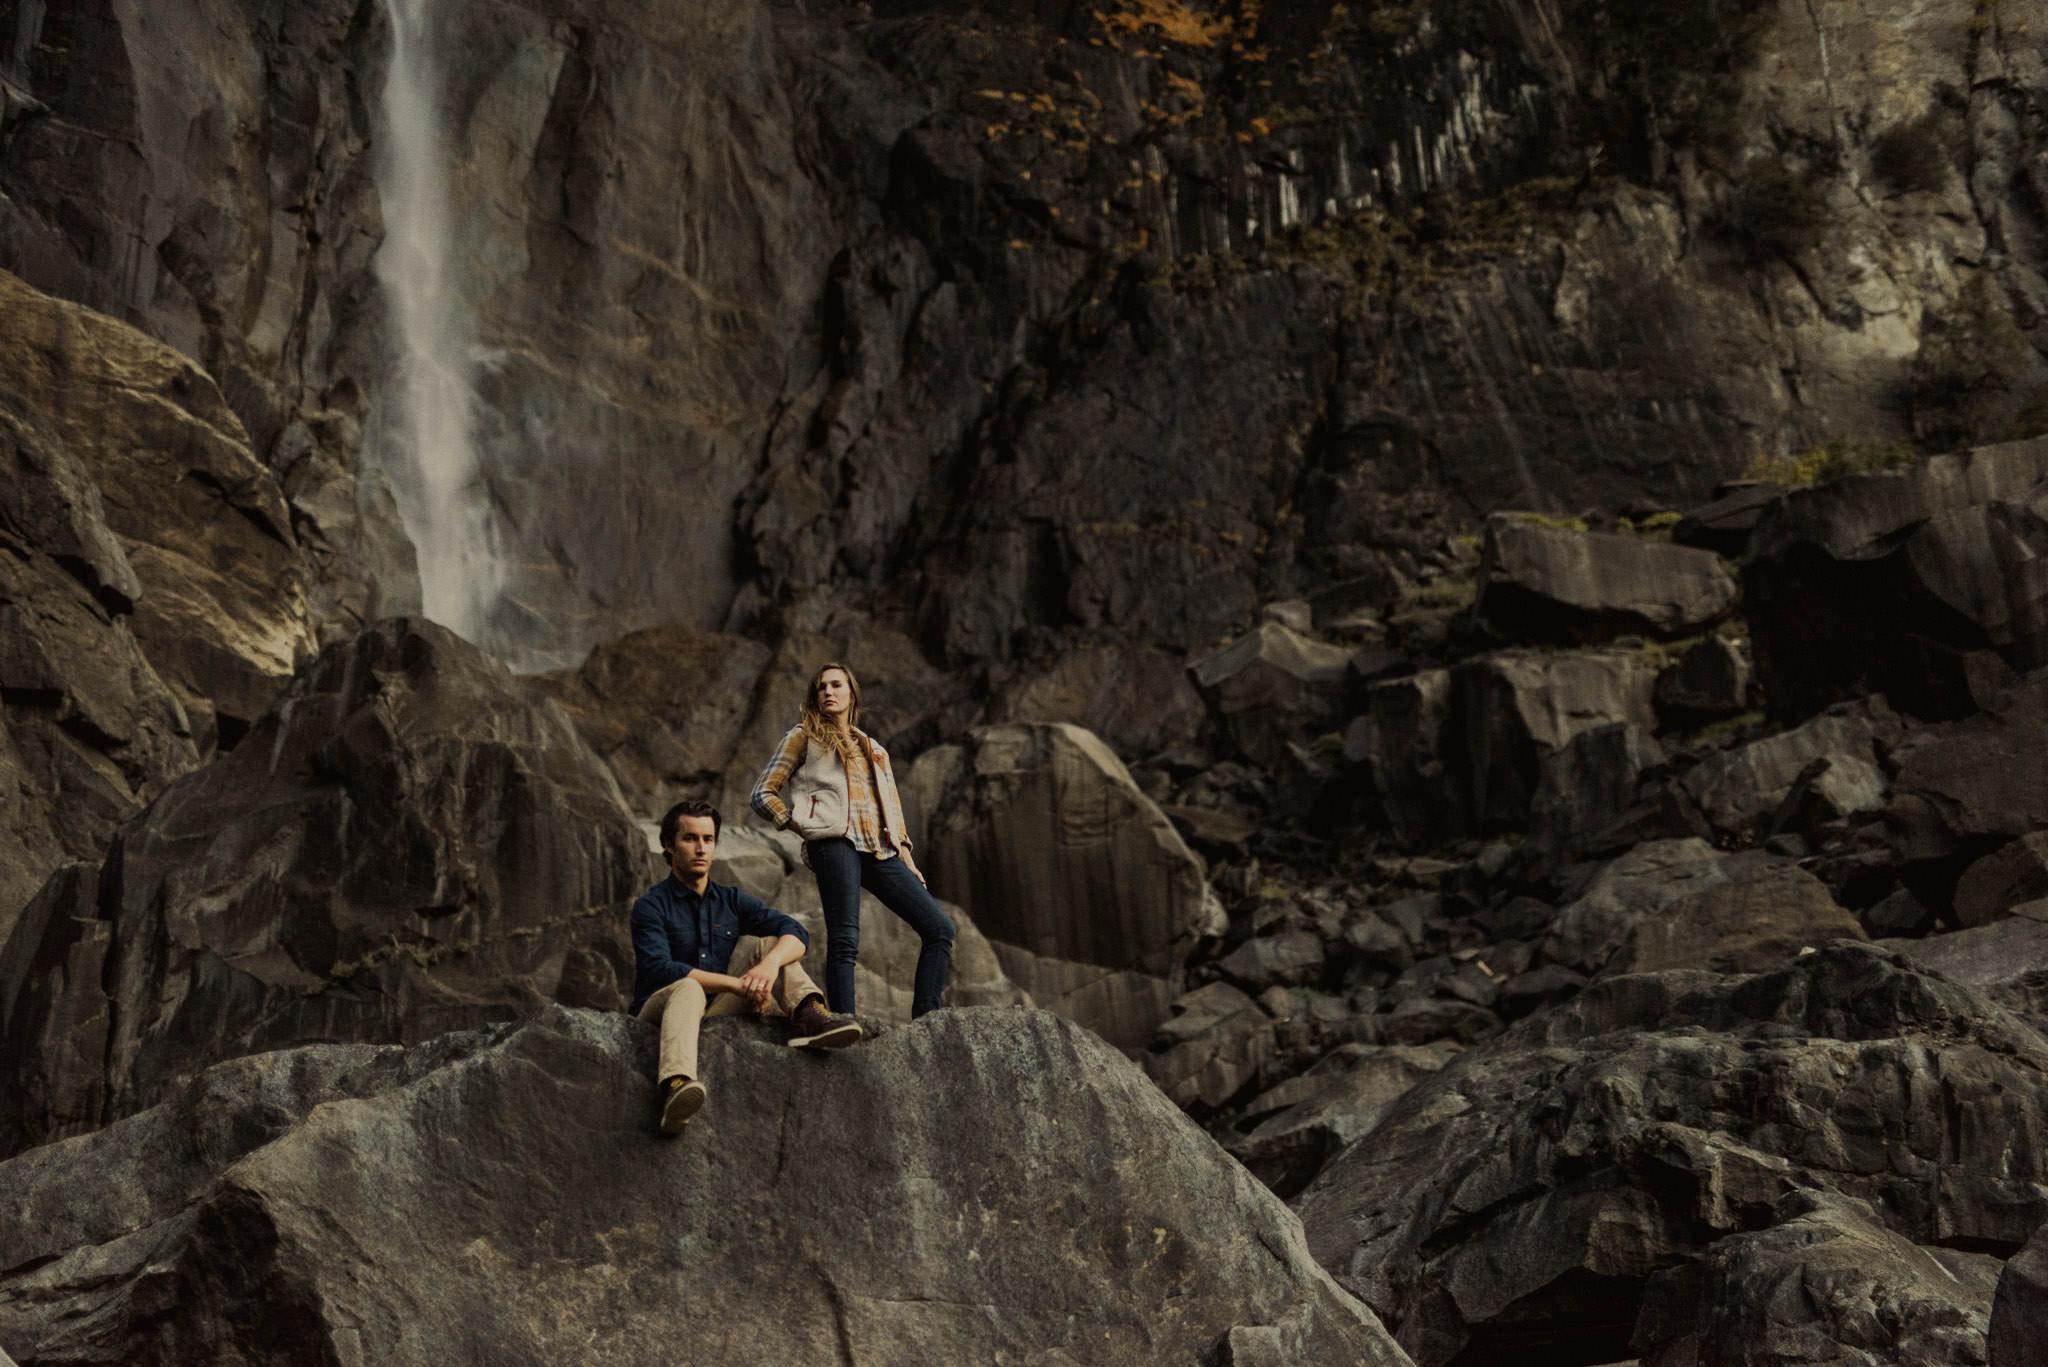 Yosemite-national-park-advenutre-elopement-wedding-photographer-california